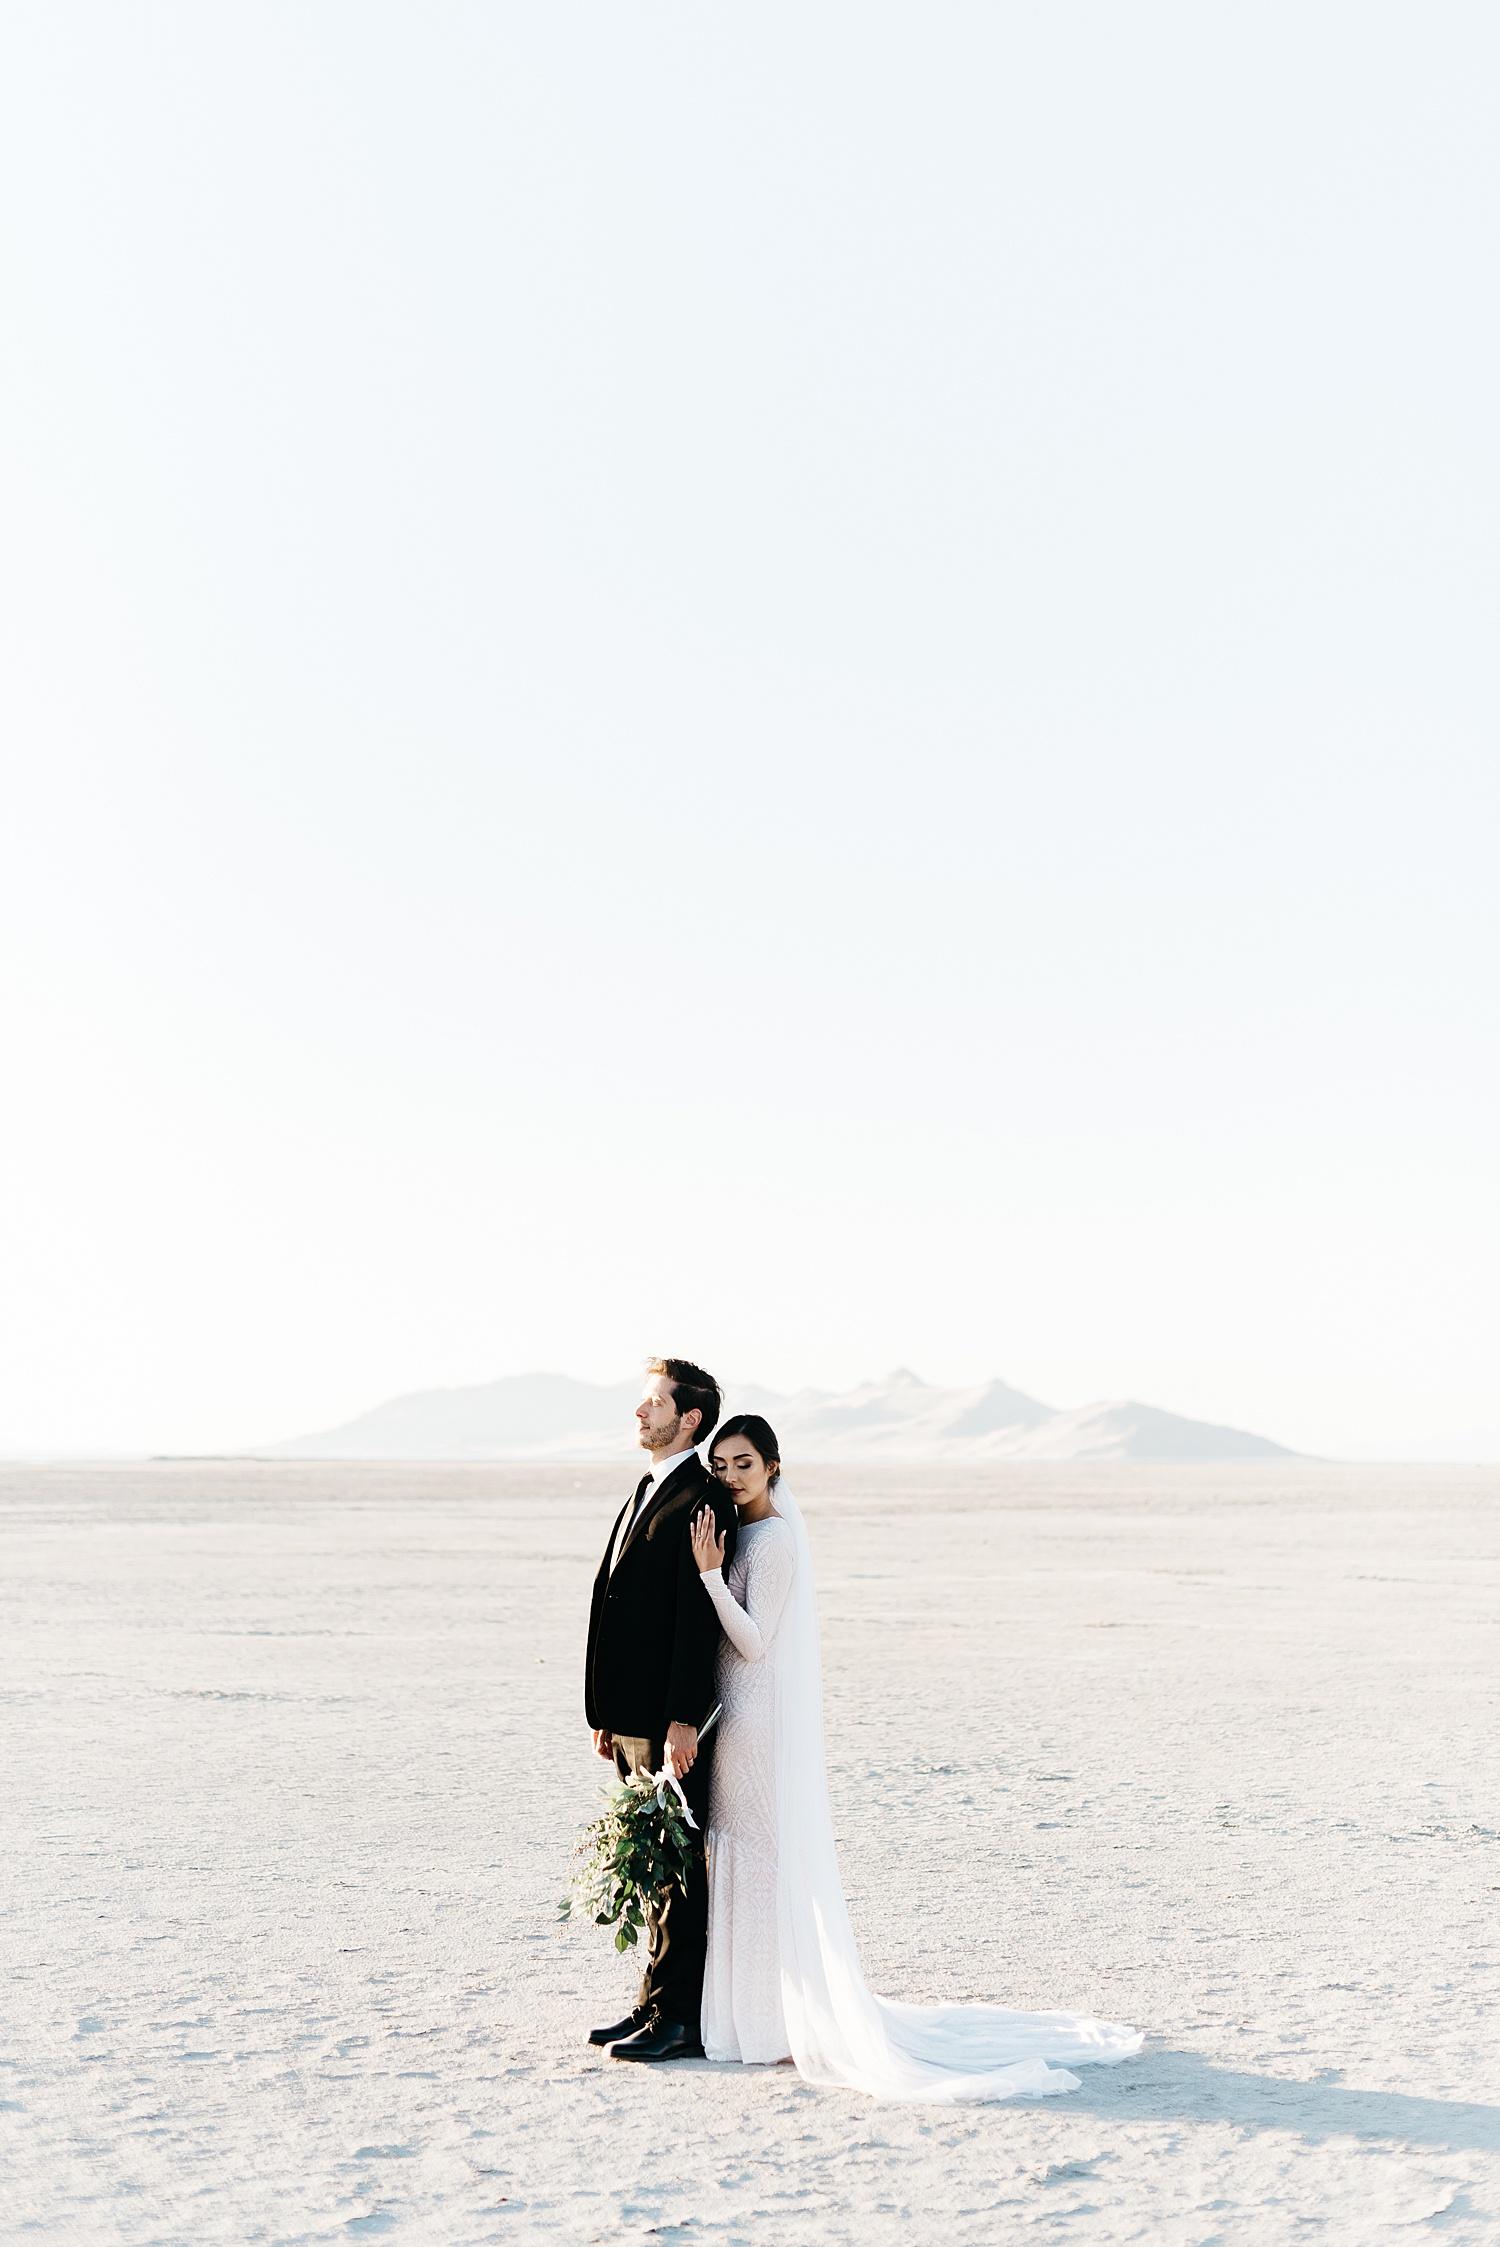 Zandra Barriga Photo - Cassie and Tristan Great Salt Lake Bridas_0004.jpg